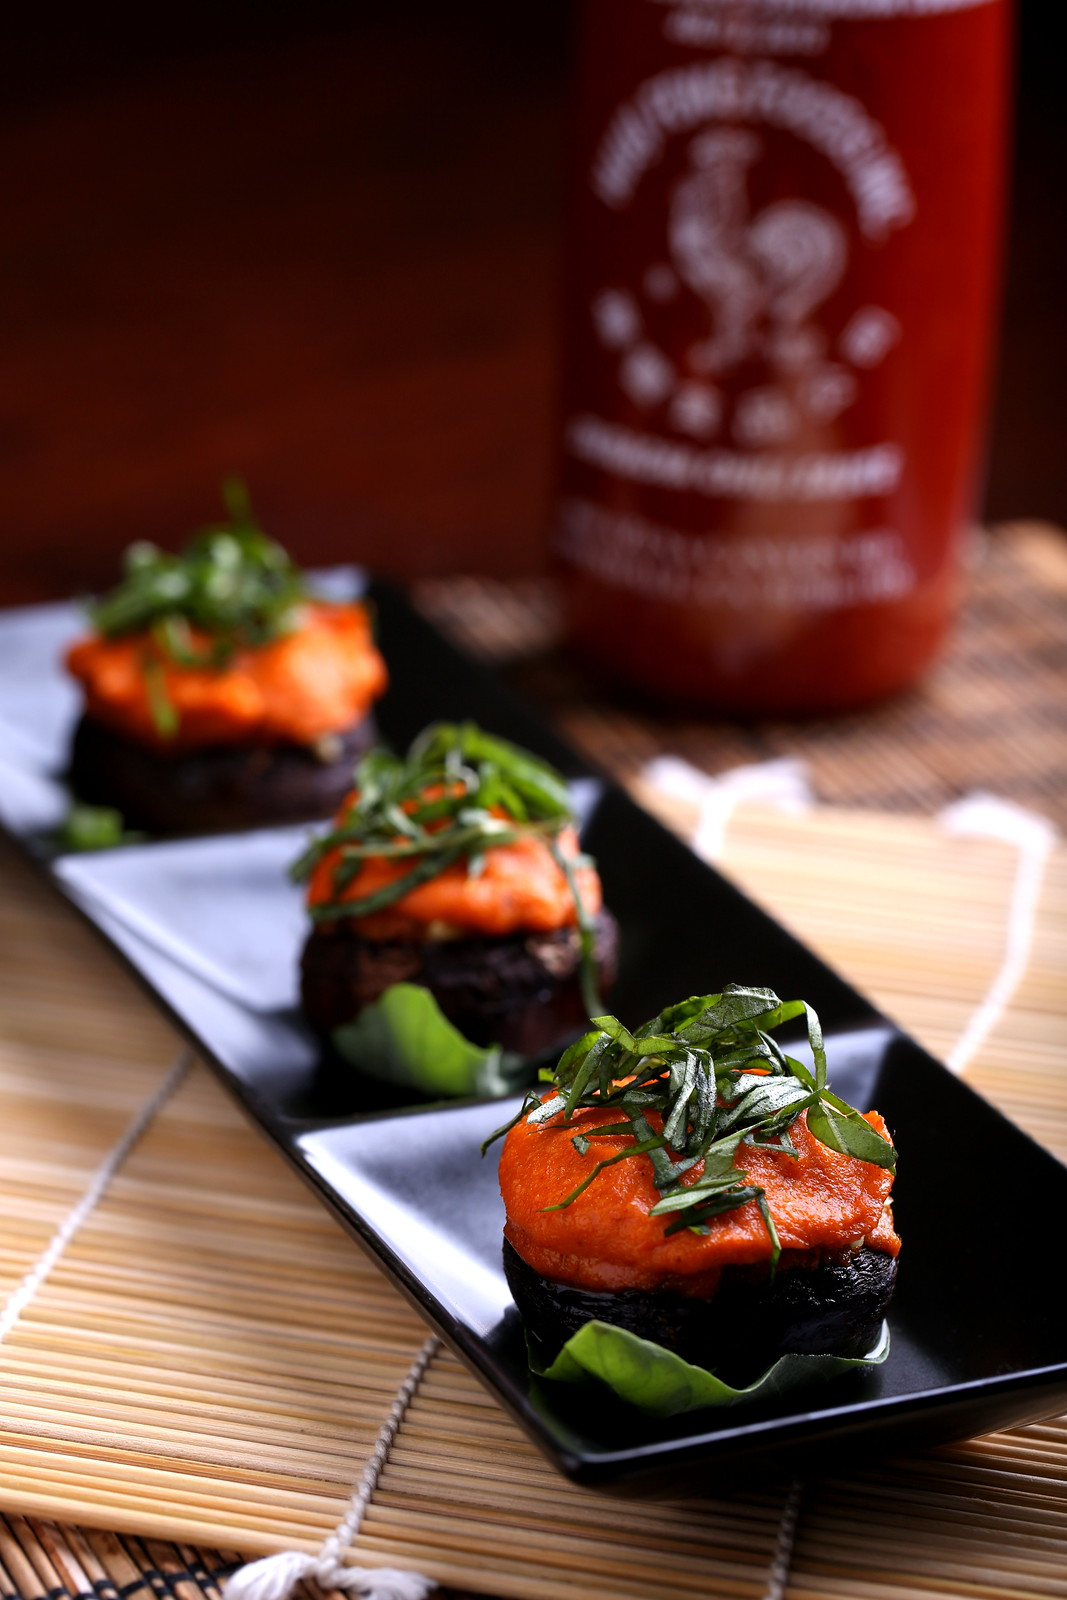 Stuffed Sriracha 'Shrooms